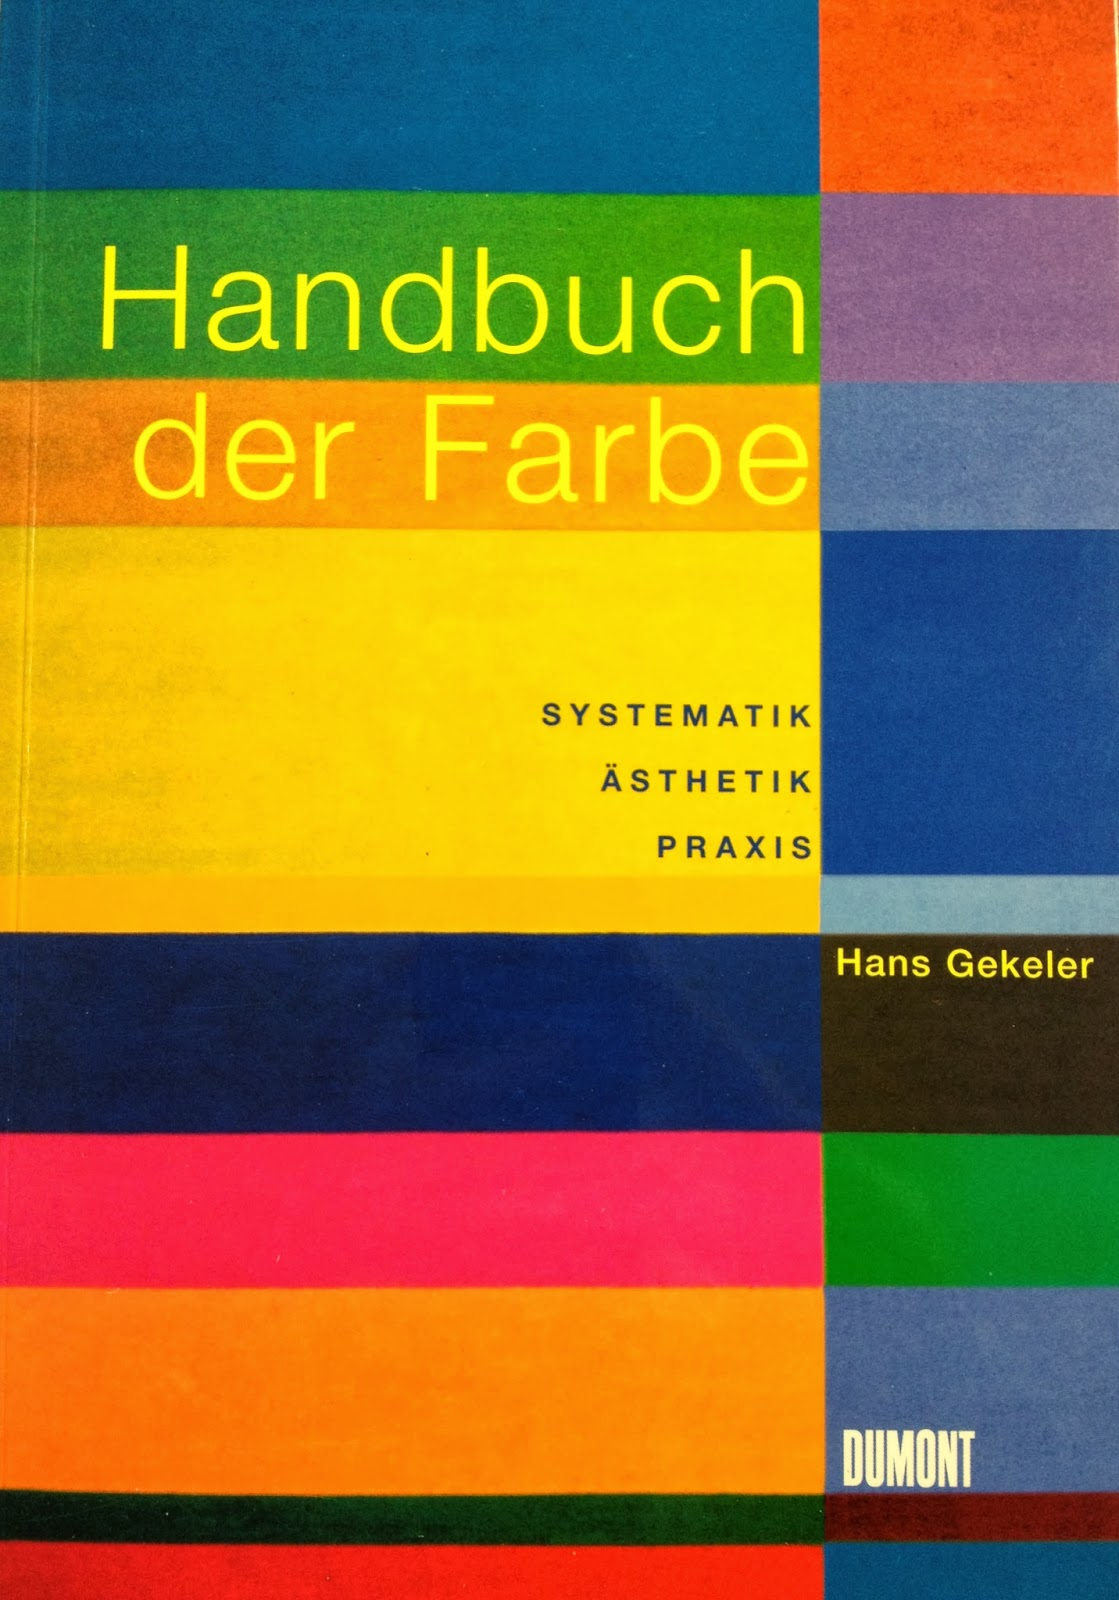 http://www.amazon.de/Handbuch-Farbe-Systematik-%C3%84sthetik-Praxis/dp/3832172890/ref=sr_1_1?ie=UTF8&qid=1390678768&sr=8-1&keywords=handbuch+der+farbe